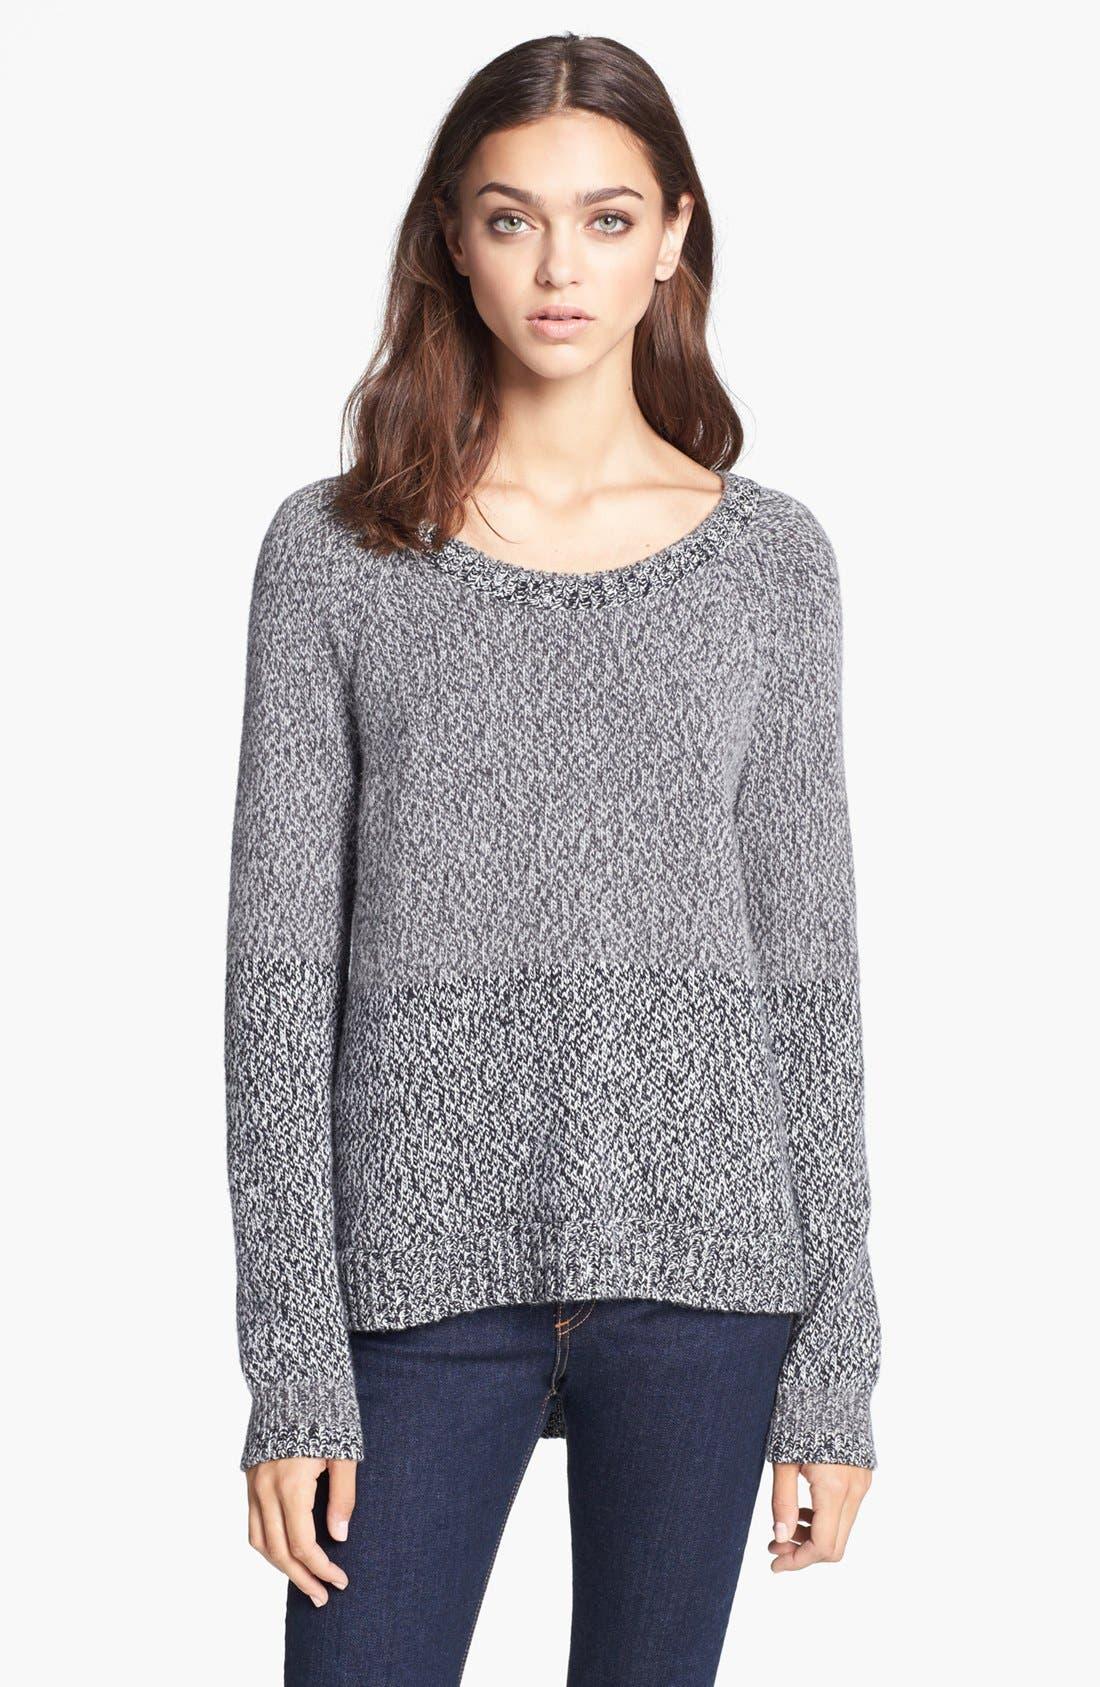 Main Image - rag & bone 'Claire' Sweater